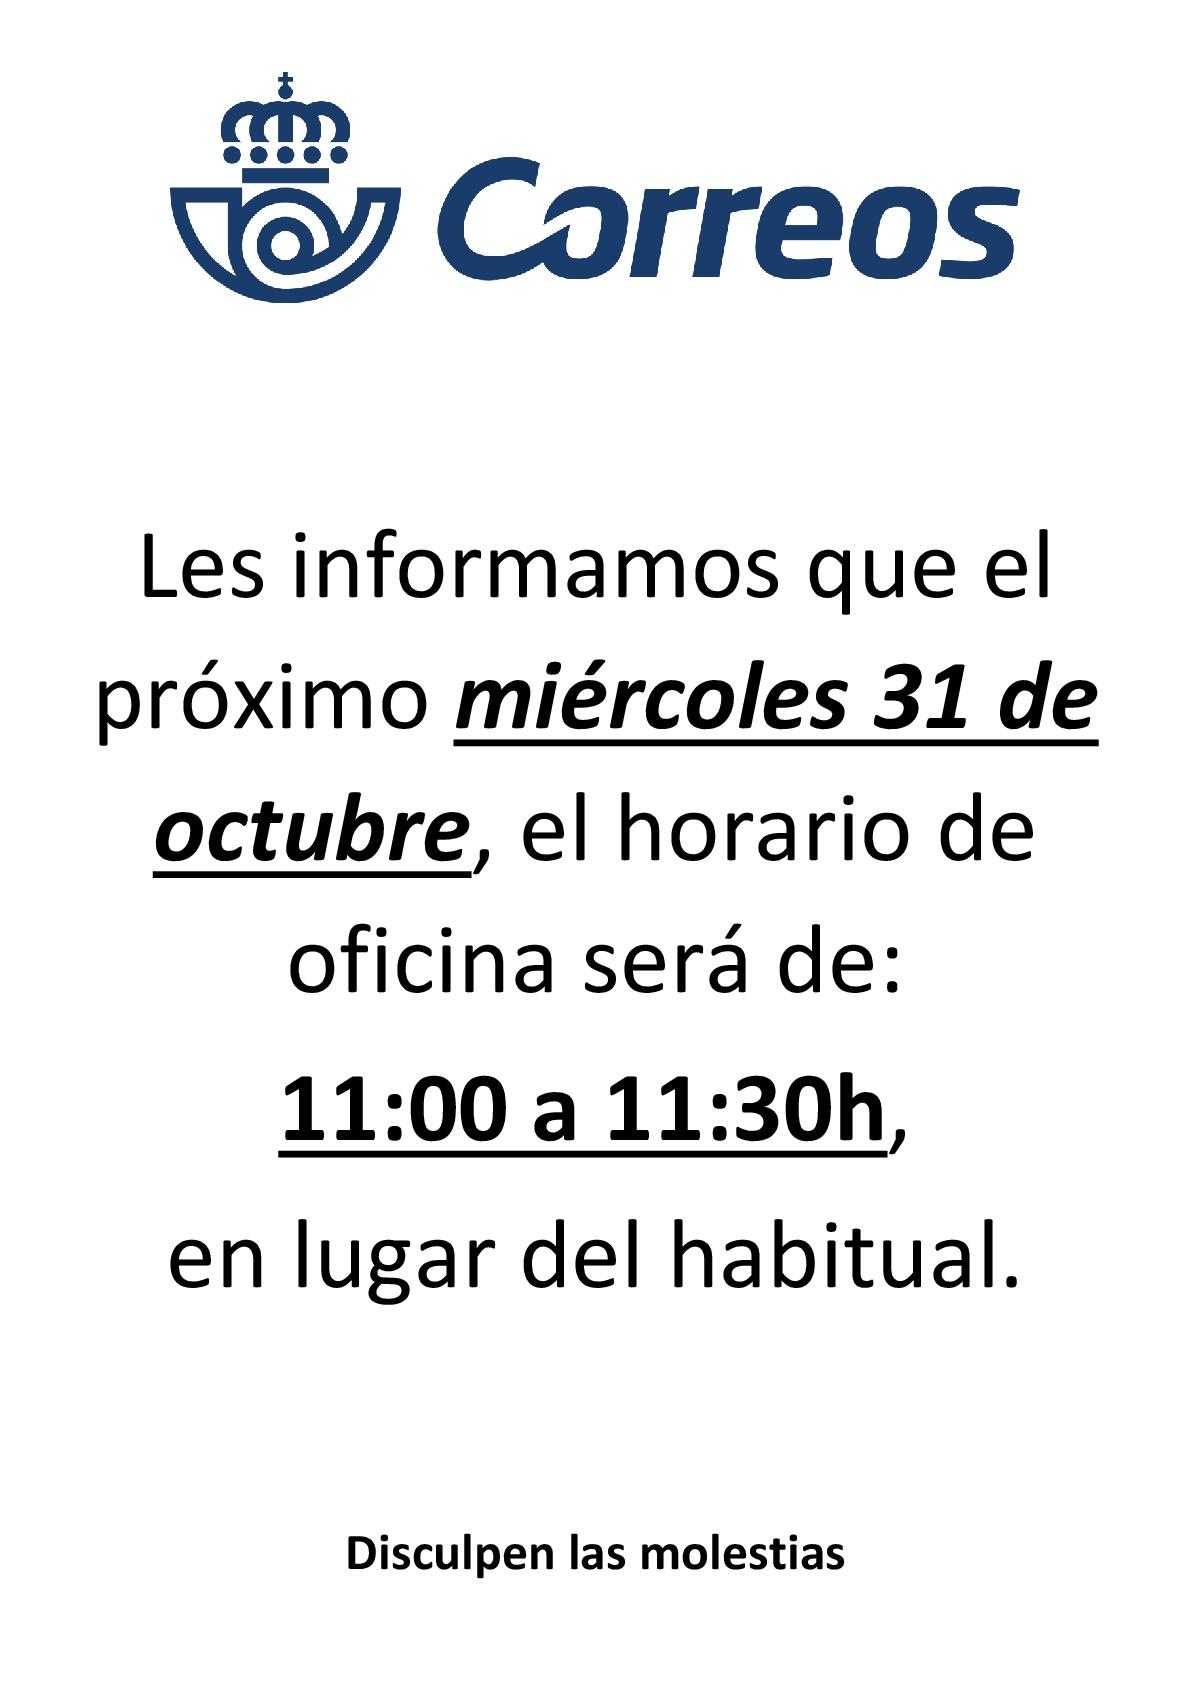 Horario especial Correos 31.10.18